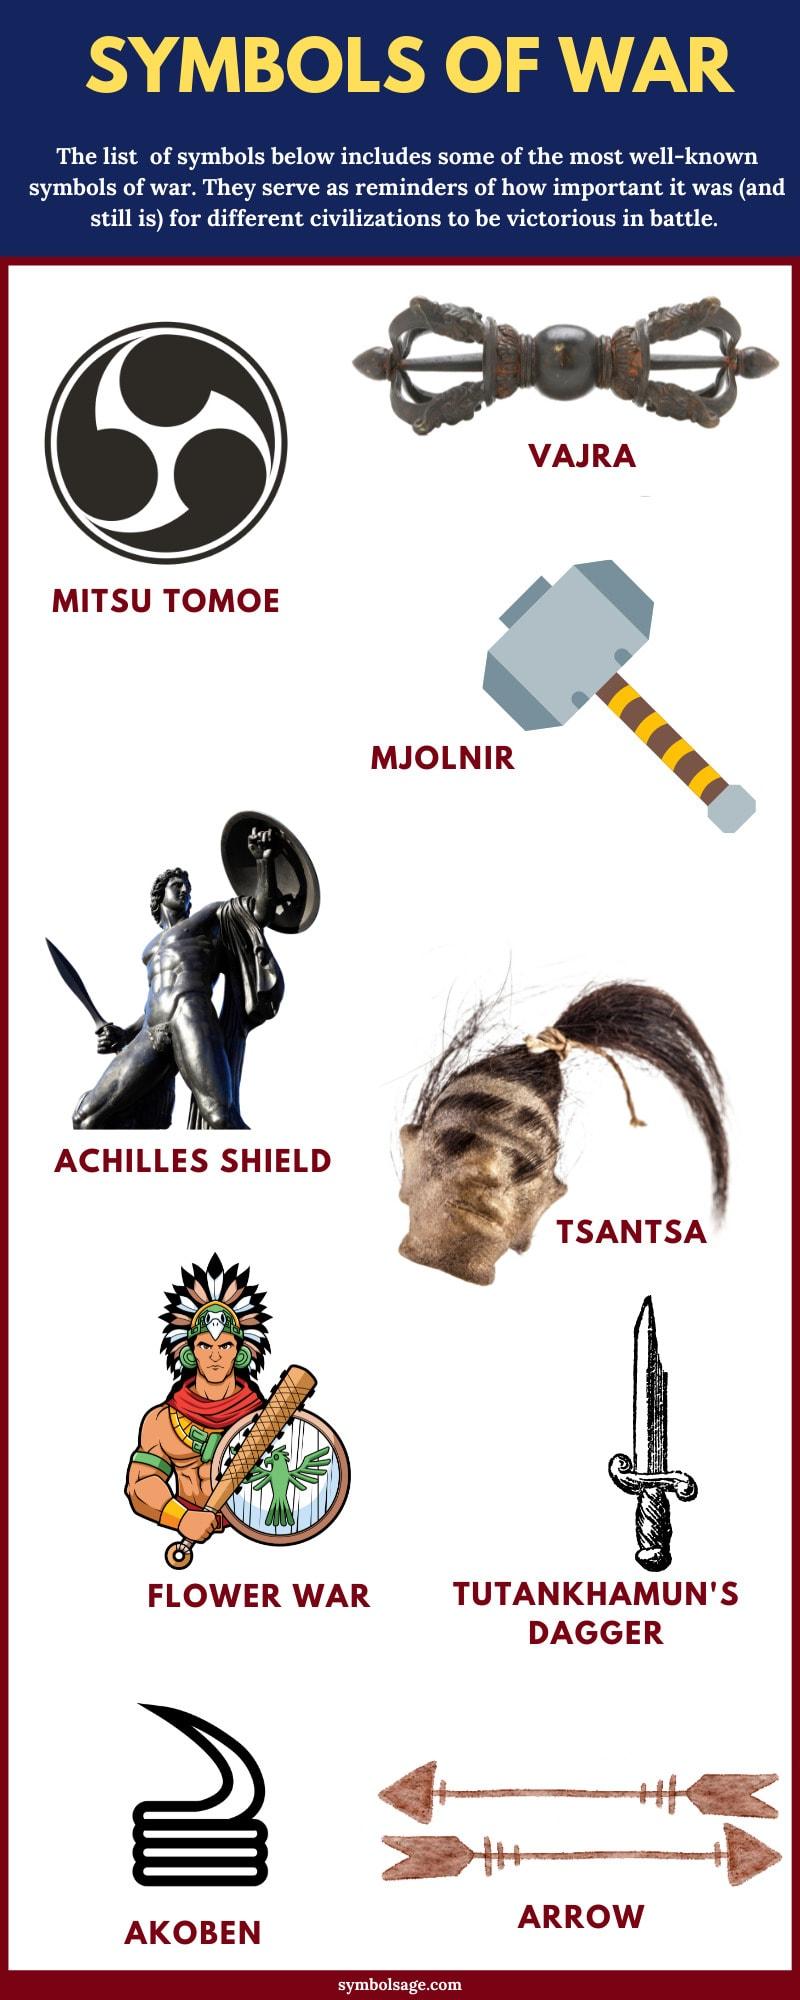 Symbols of war list